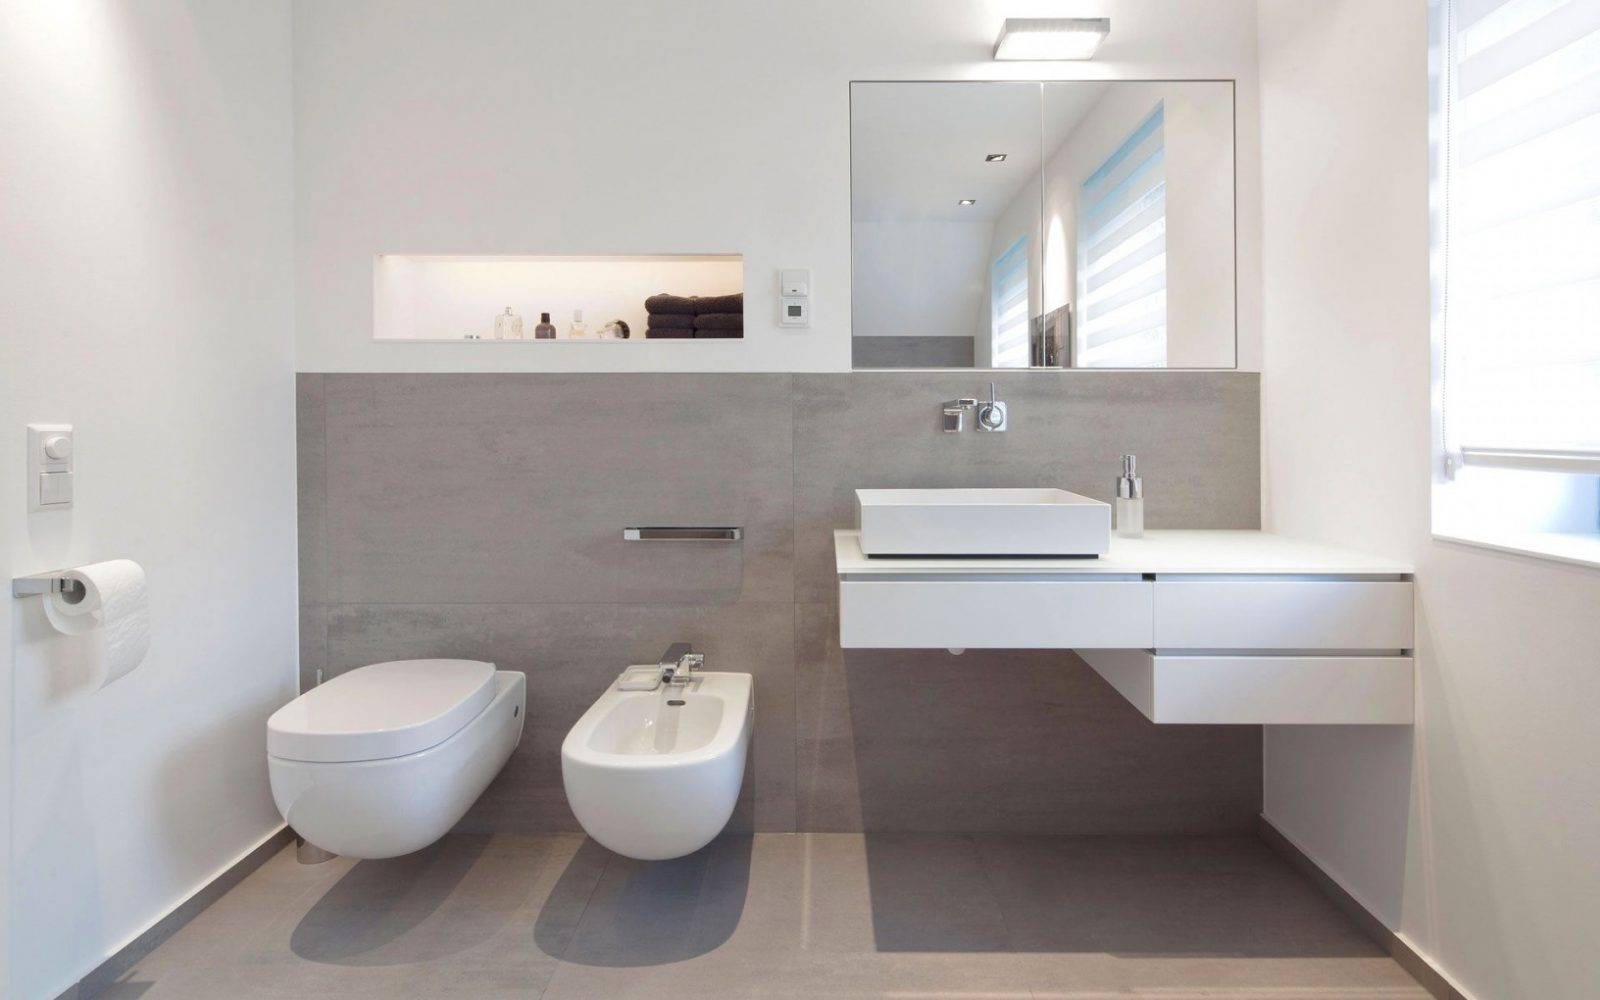 Badezimmer Ideen Fernen Verführerisch Moderne Badezimmer von Badezimmer Fliesen Modern Photo